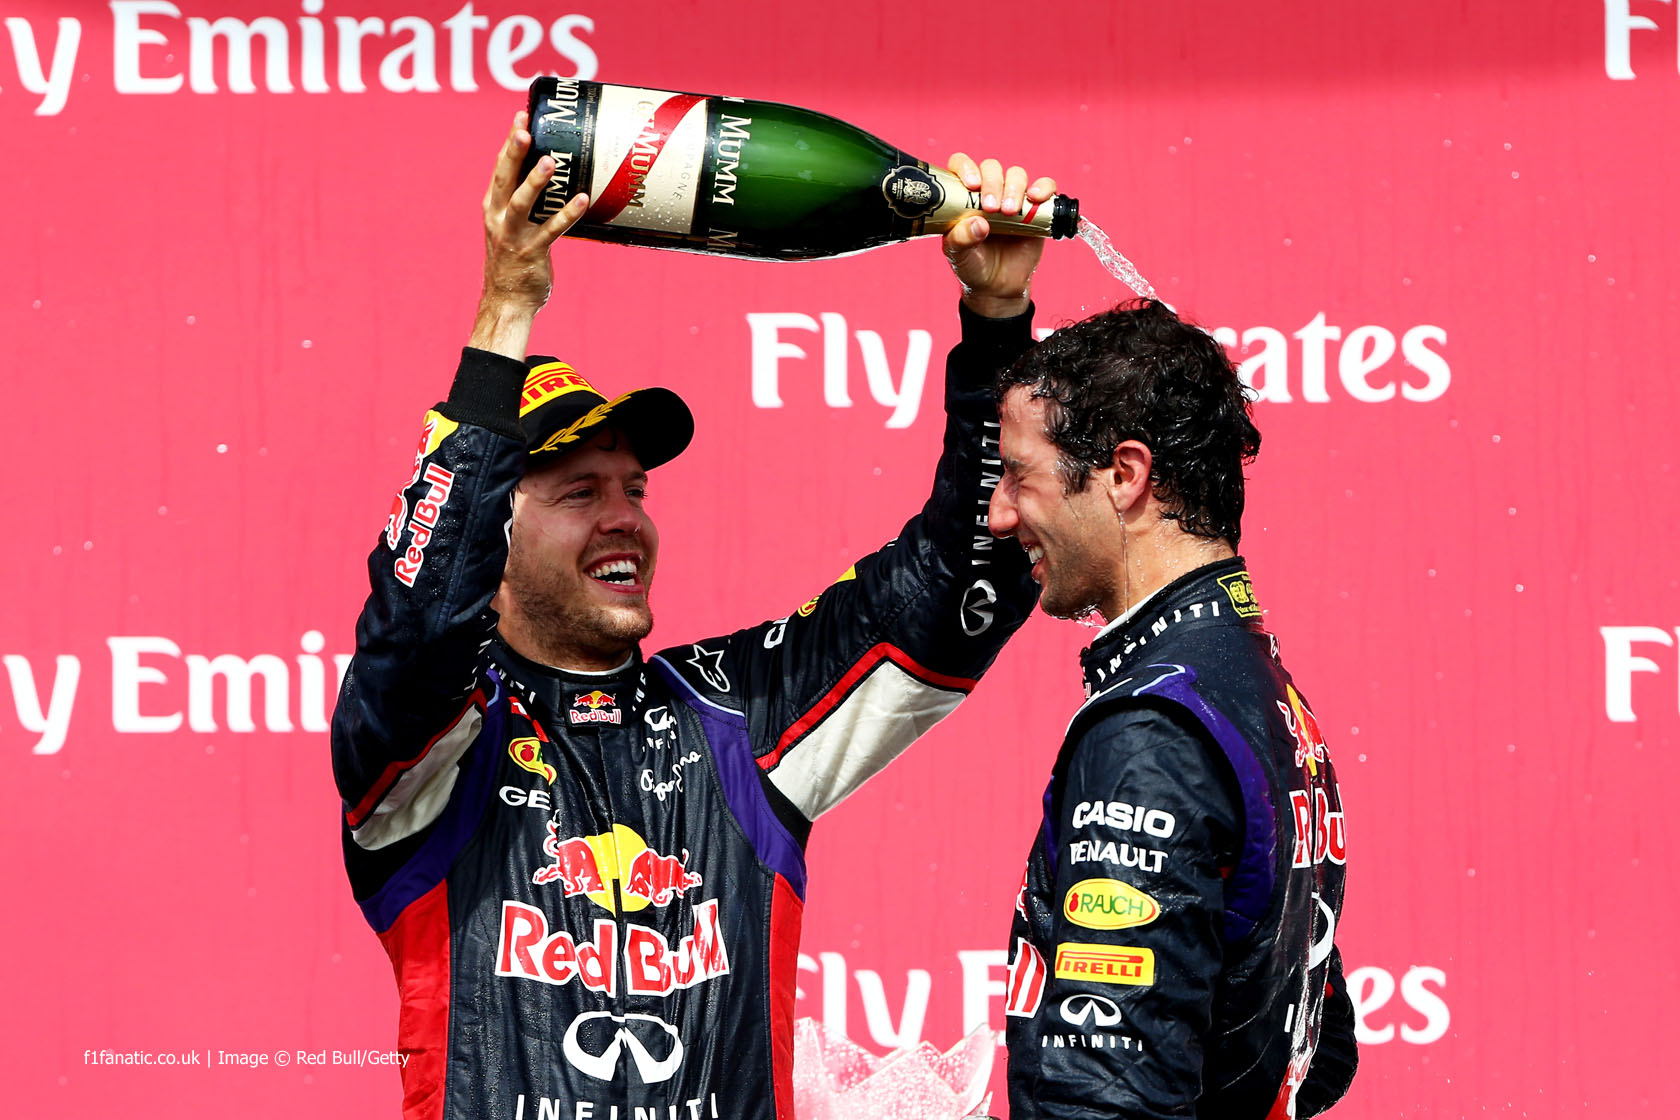 Sebastian Vettel, Daniel Ricciardo, Red Bull, Circuit Gilles Villeneuve, 2014